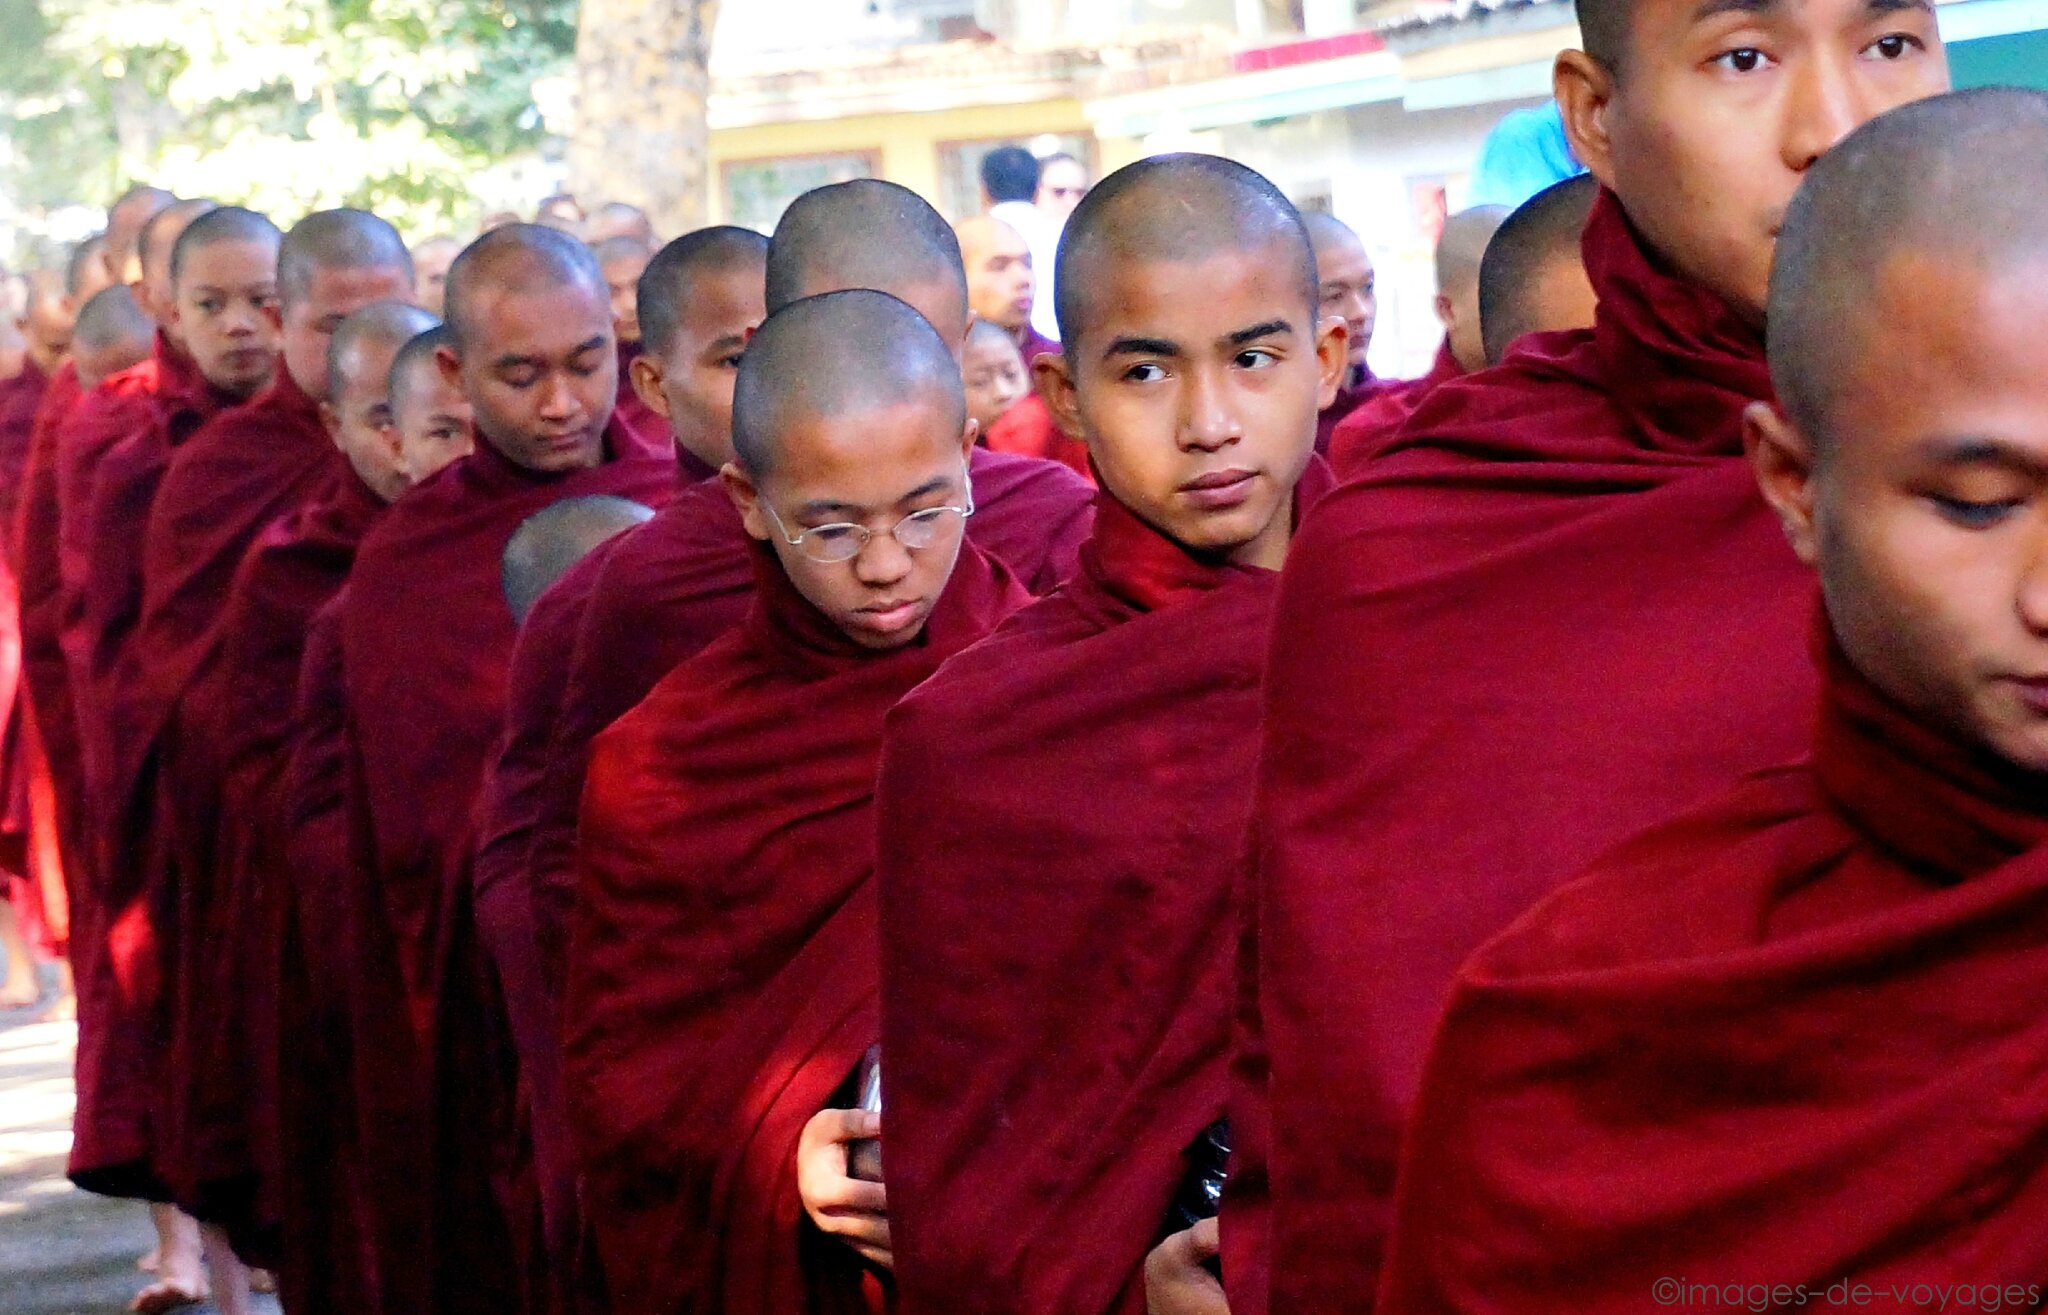 Repas des moines - Mandalay - Myanmar (Birmanie)